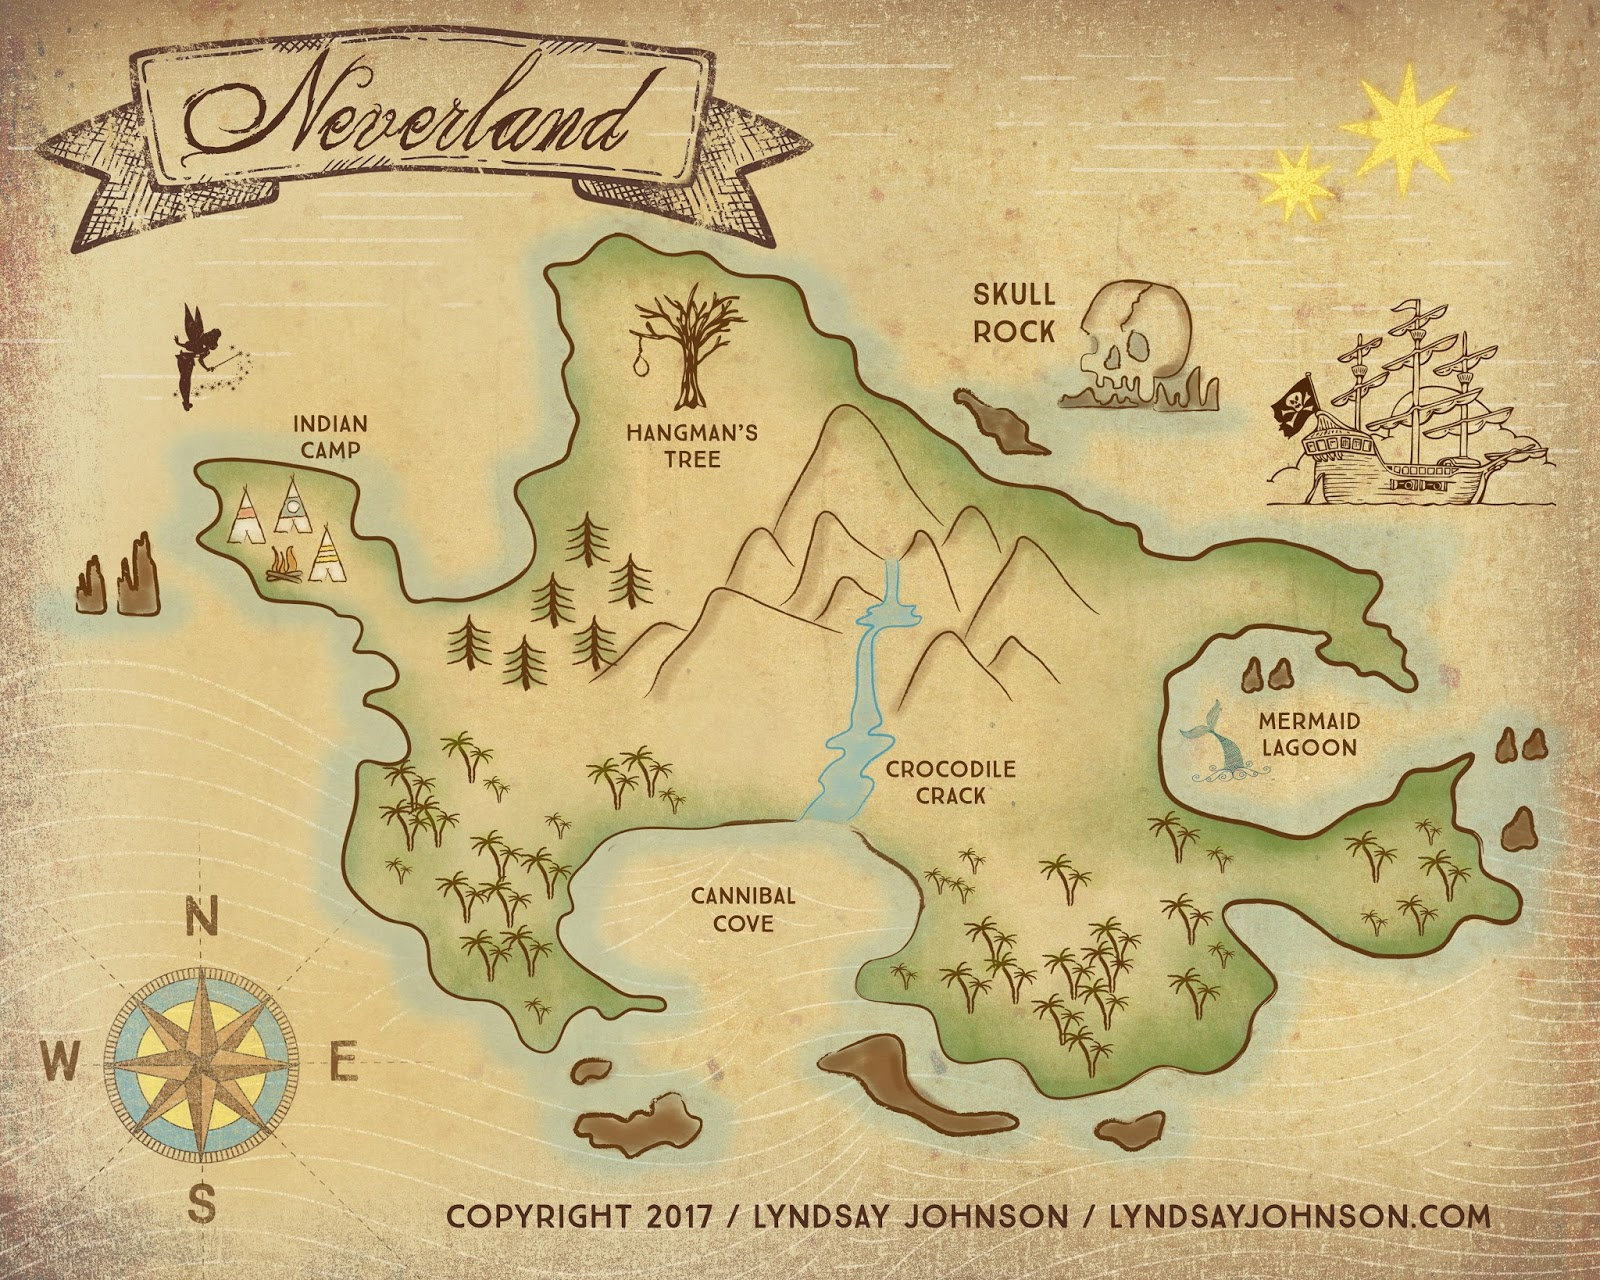 Lyndsay Johnson Neverland Map Downloadable Print - I have a map